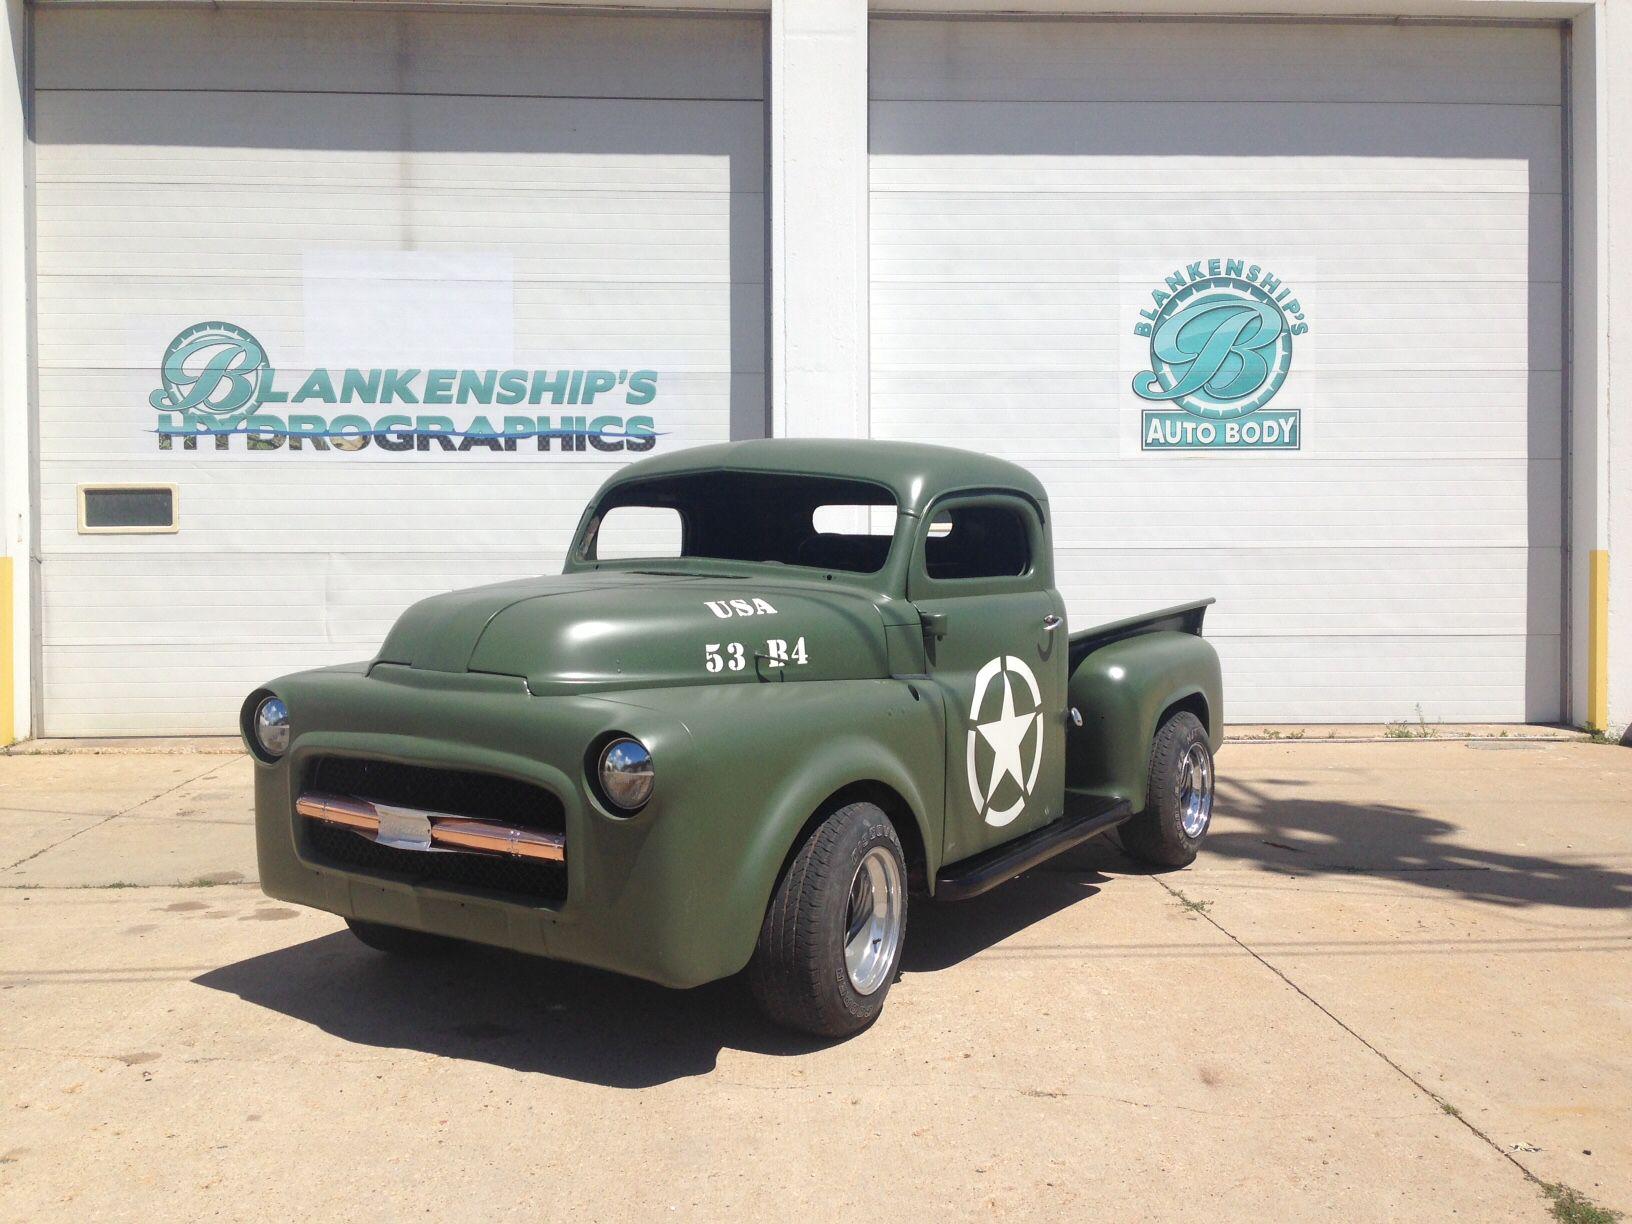 Blankenship s auto body chop top 1953 dodge pickup b4b